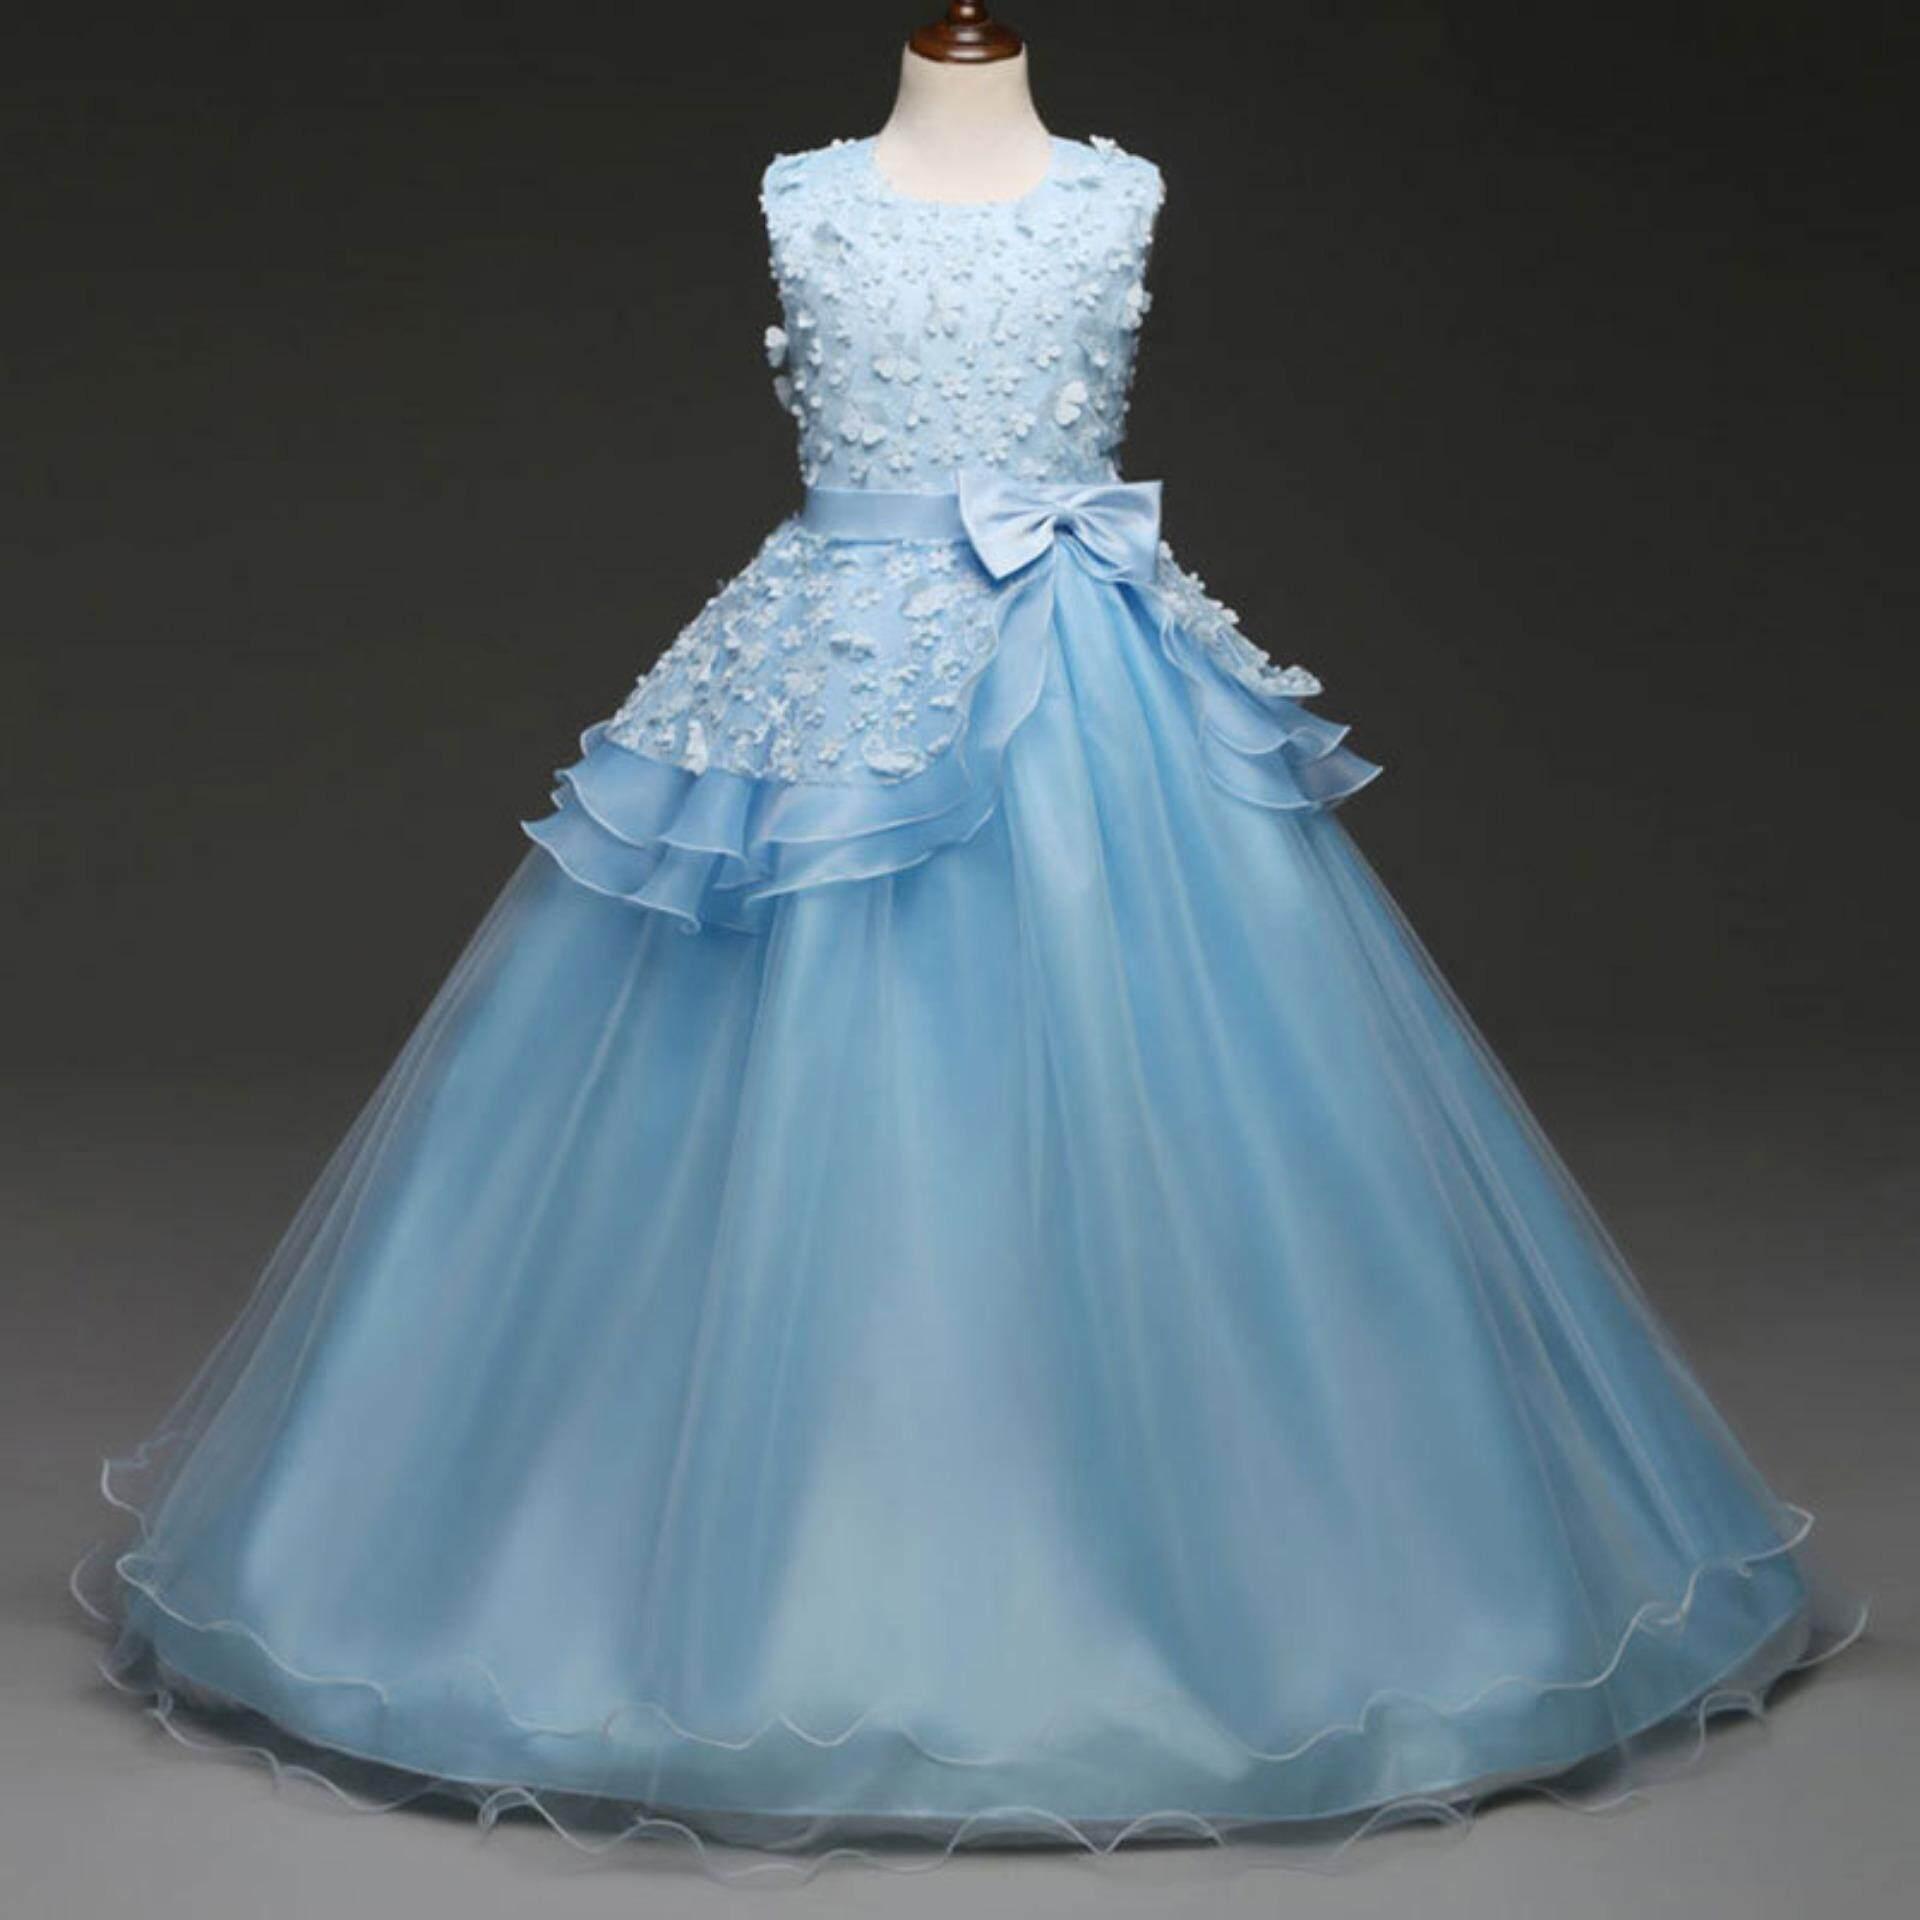 Girls Dresses - Buy Girls Dresses at Best Price in Singapore   www ...